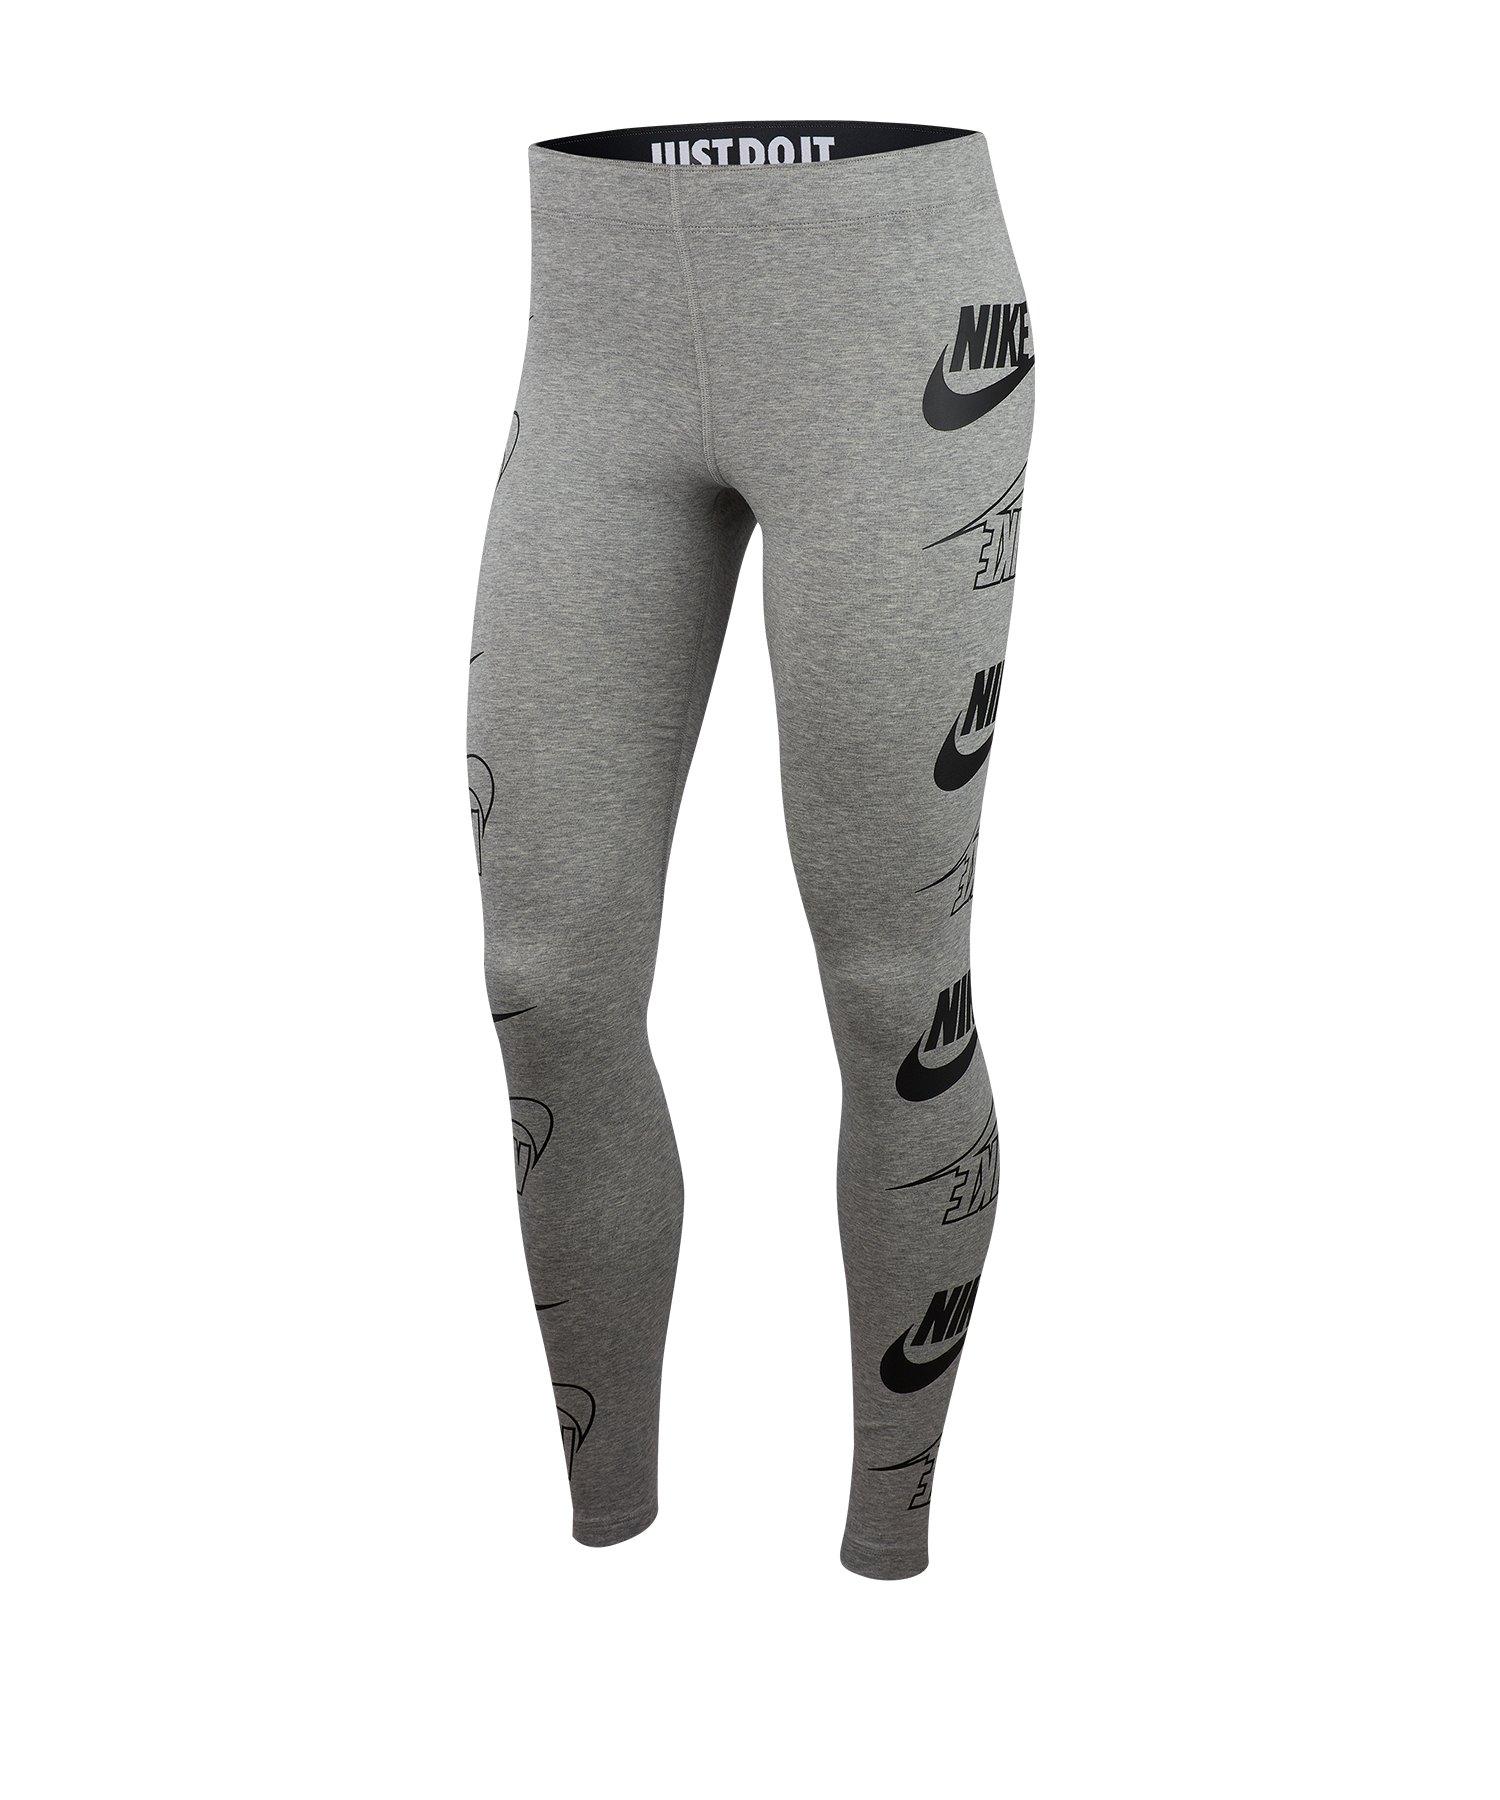 Nike Leg-A-See Legging Damen Grau F064 - grau